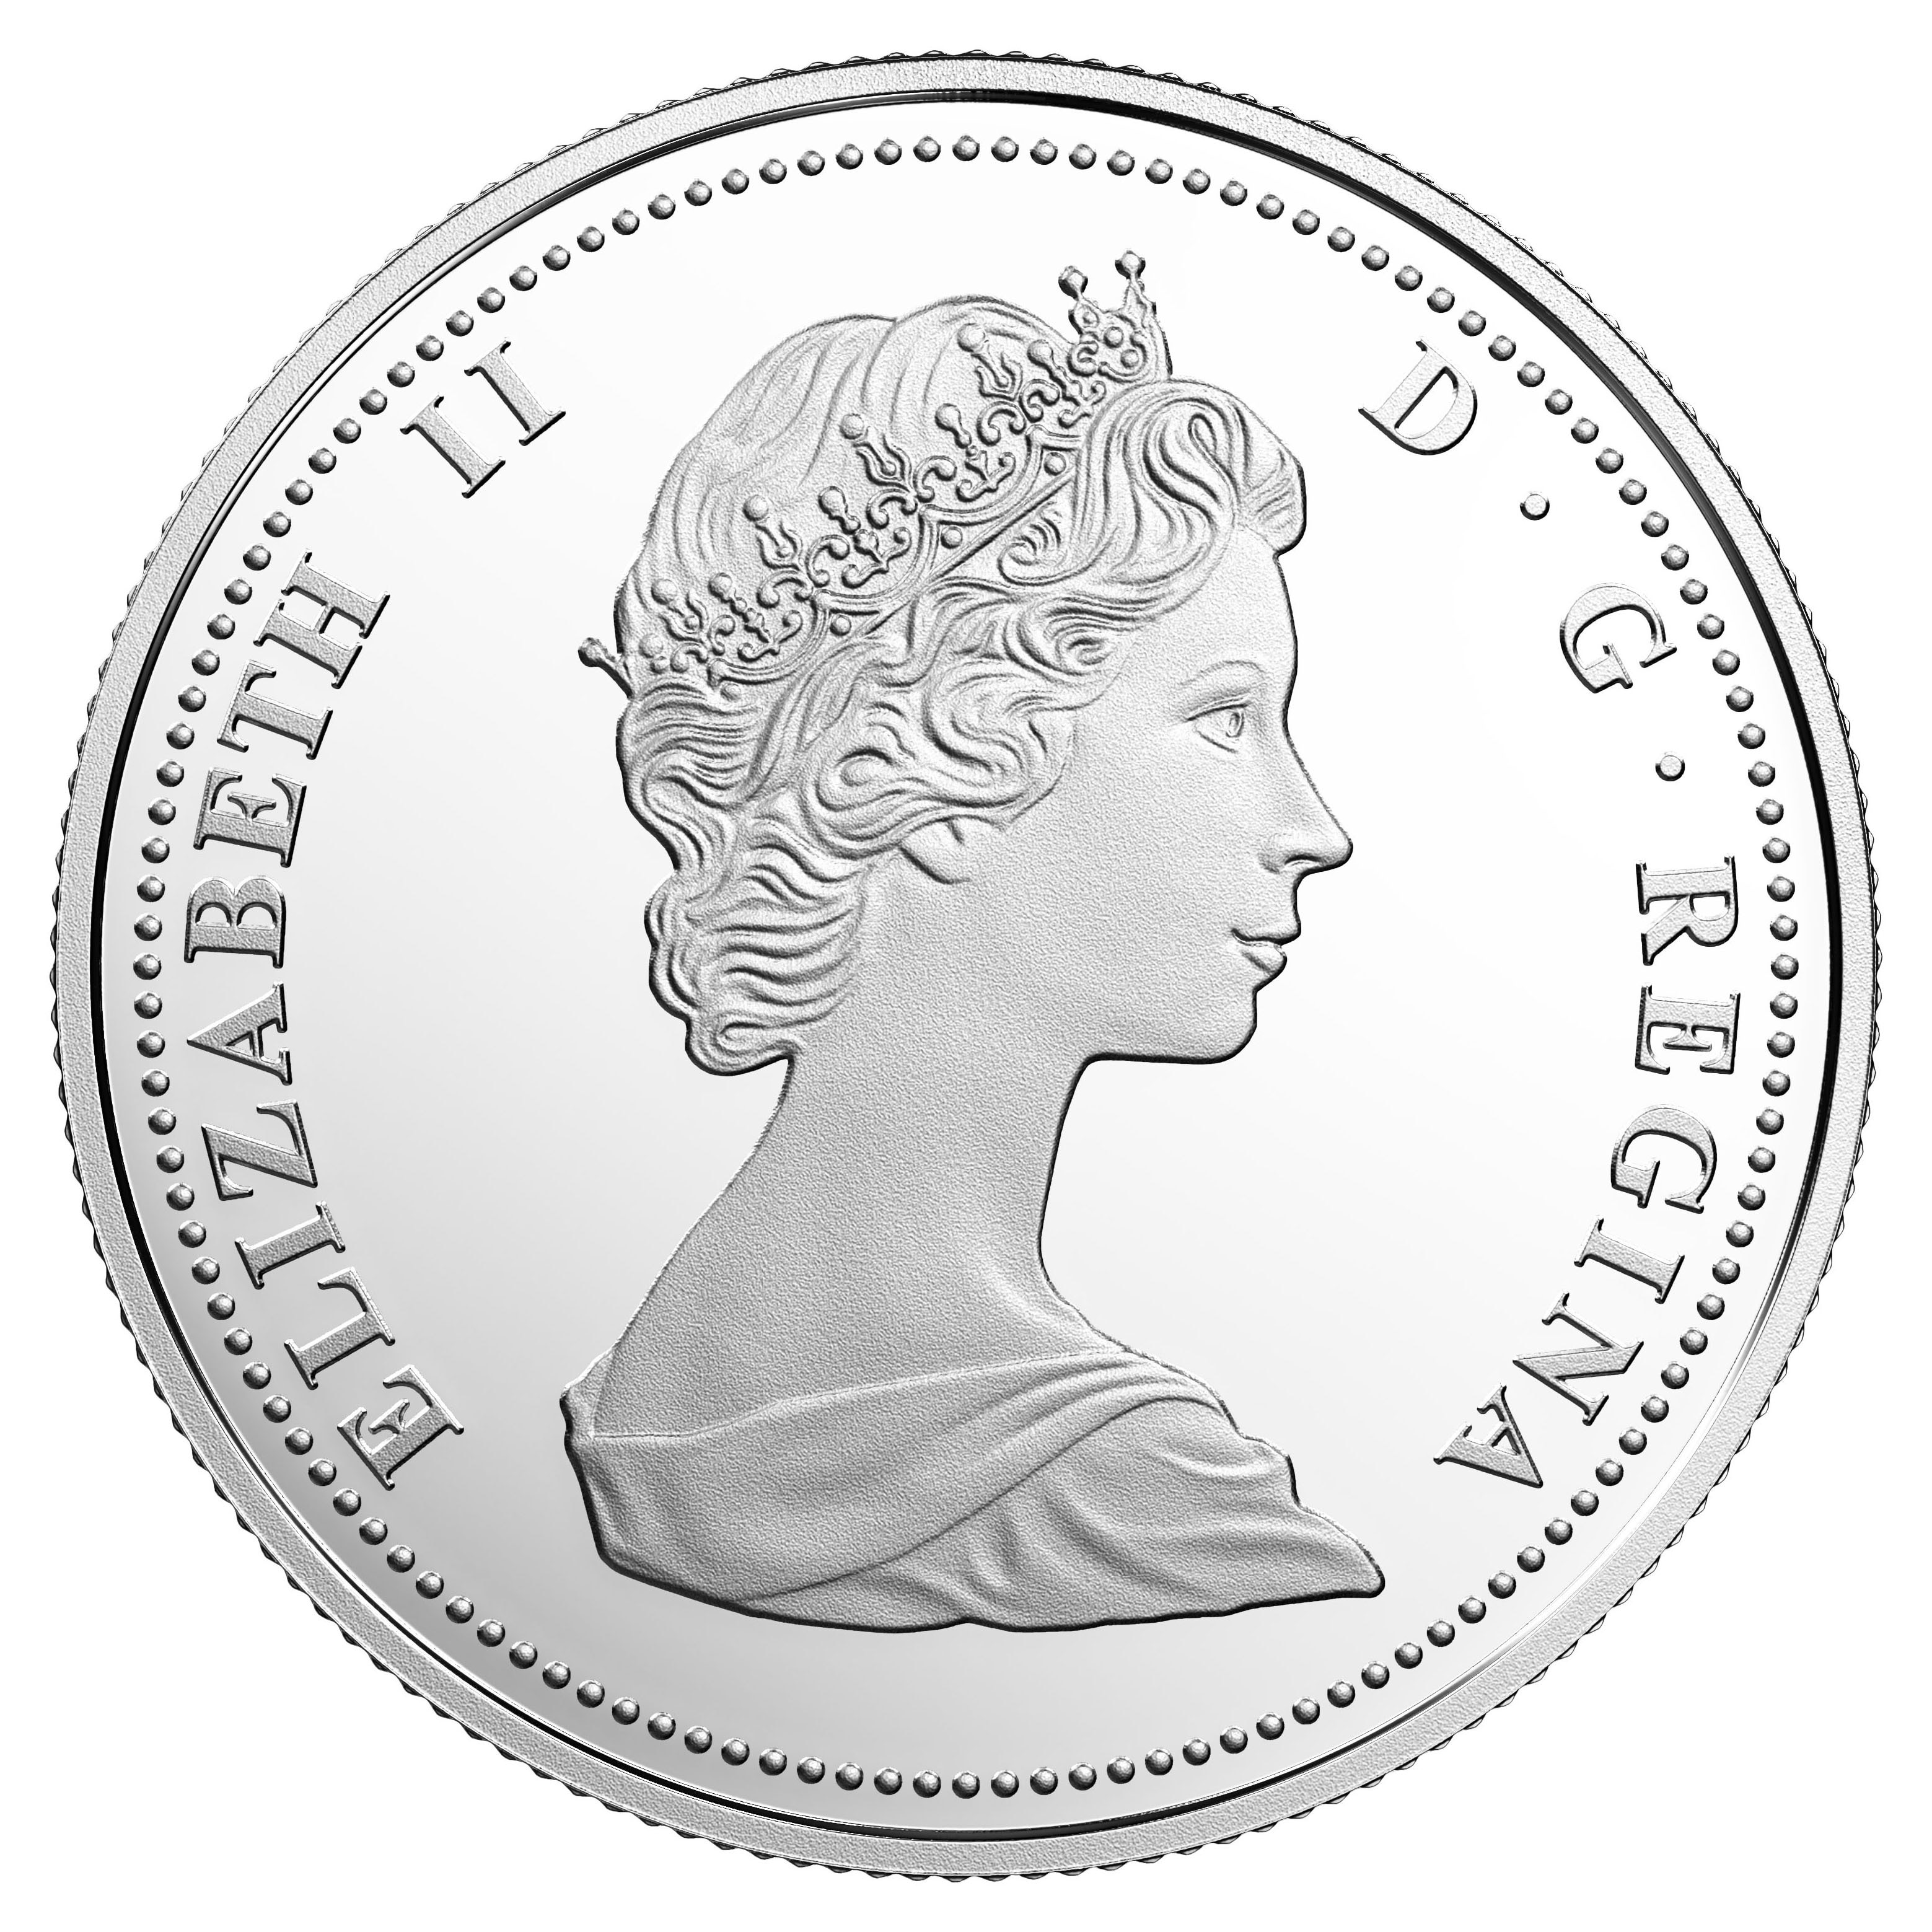 CANADA 1967-2017 5 CENTS 99.99/% PROOF SILVER CENTENNIAL NICKEL COIN